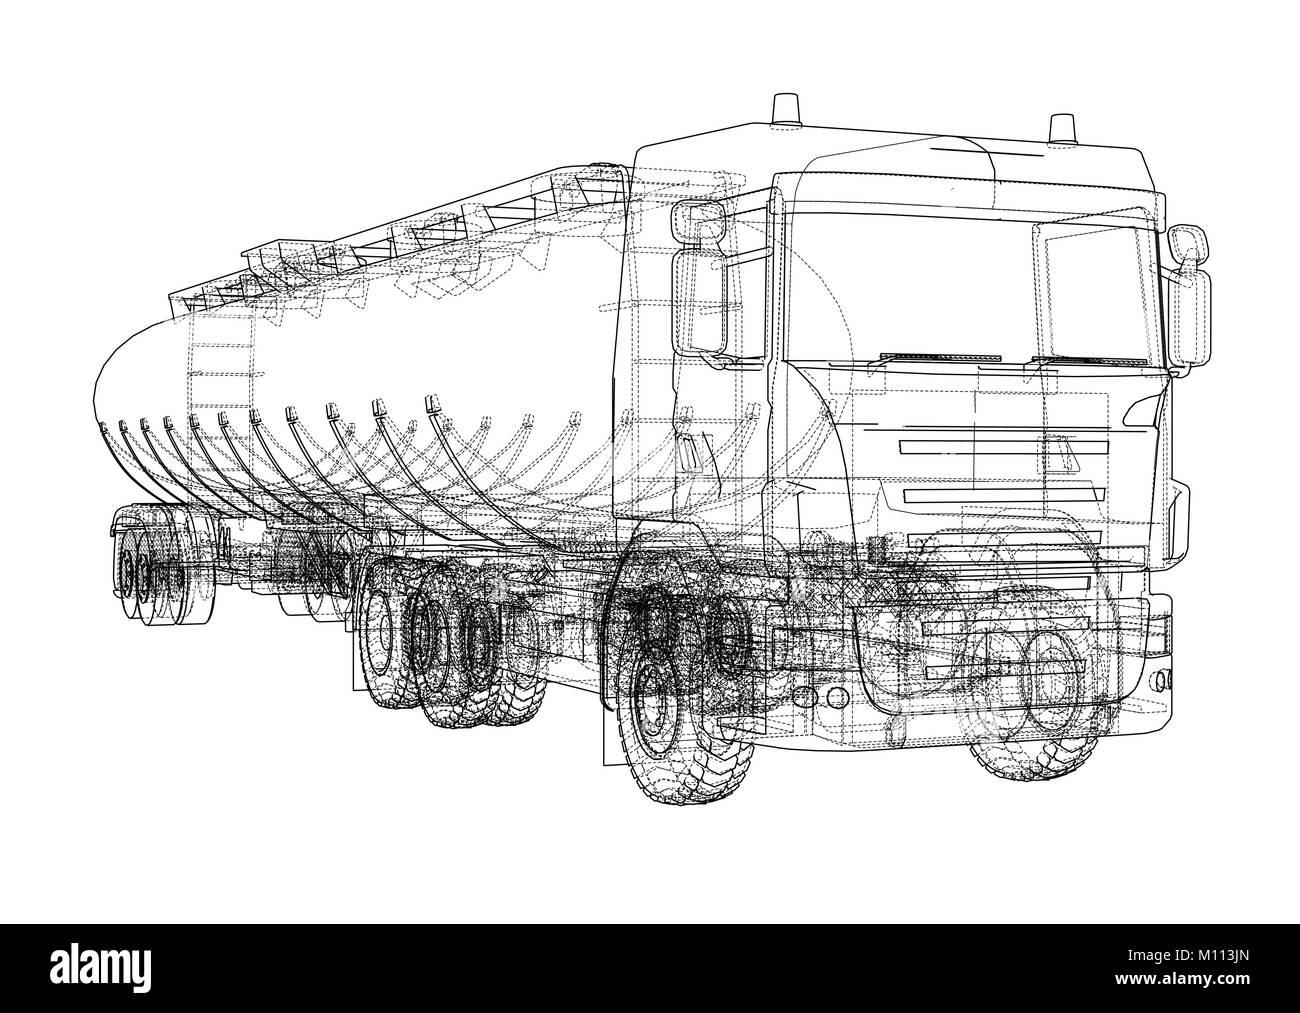 Fuel Freight Stockfotos & Fuel Freight Bilder - Seite 11 - Alamy